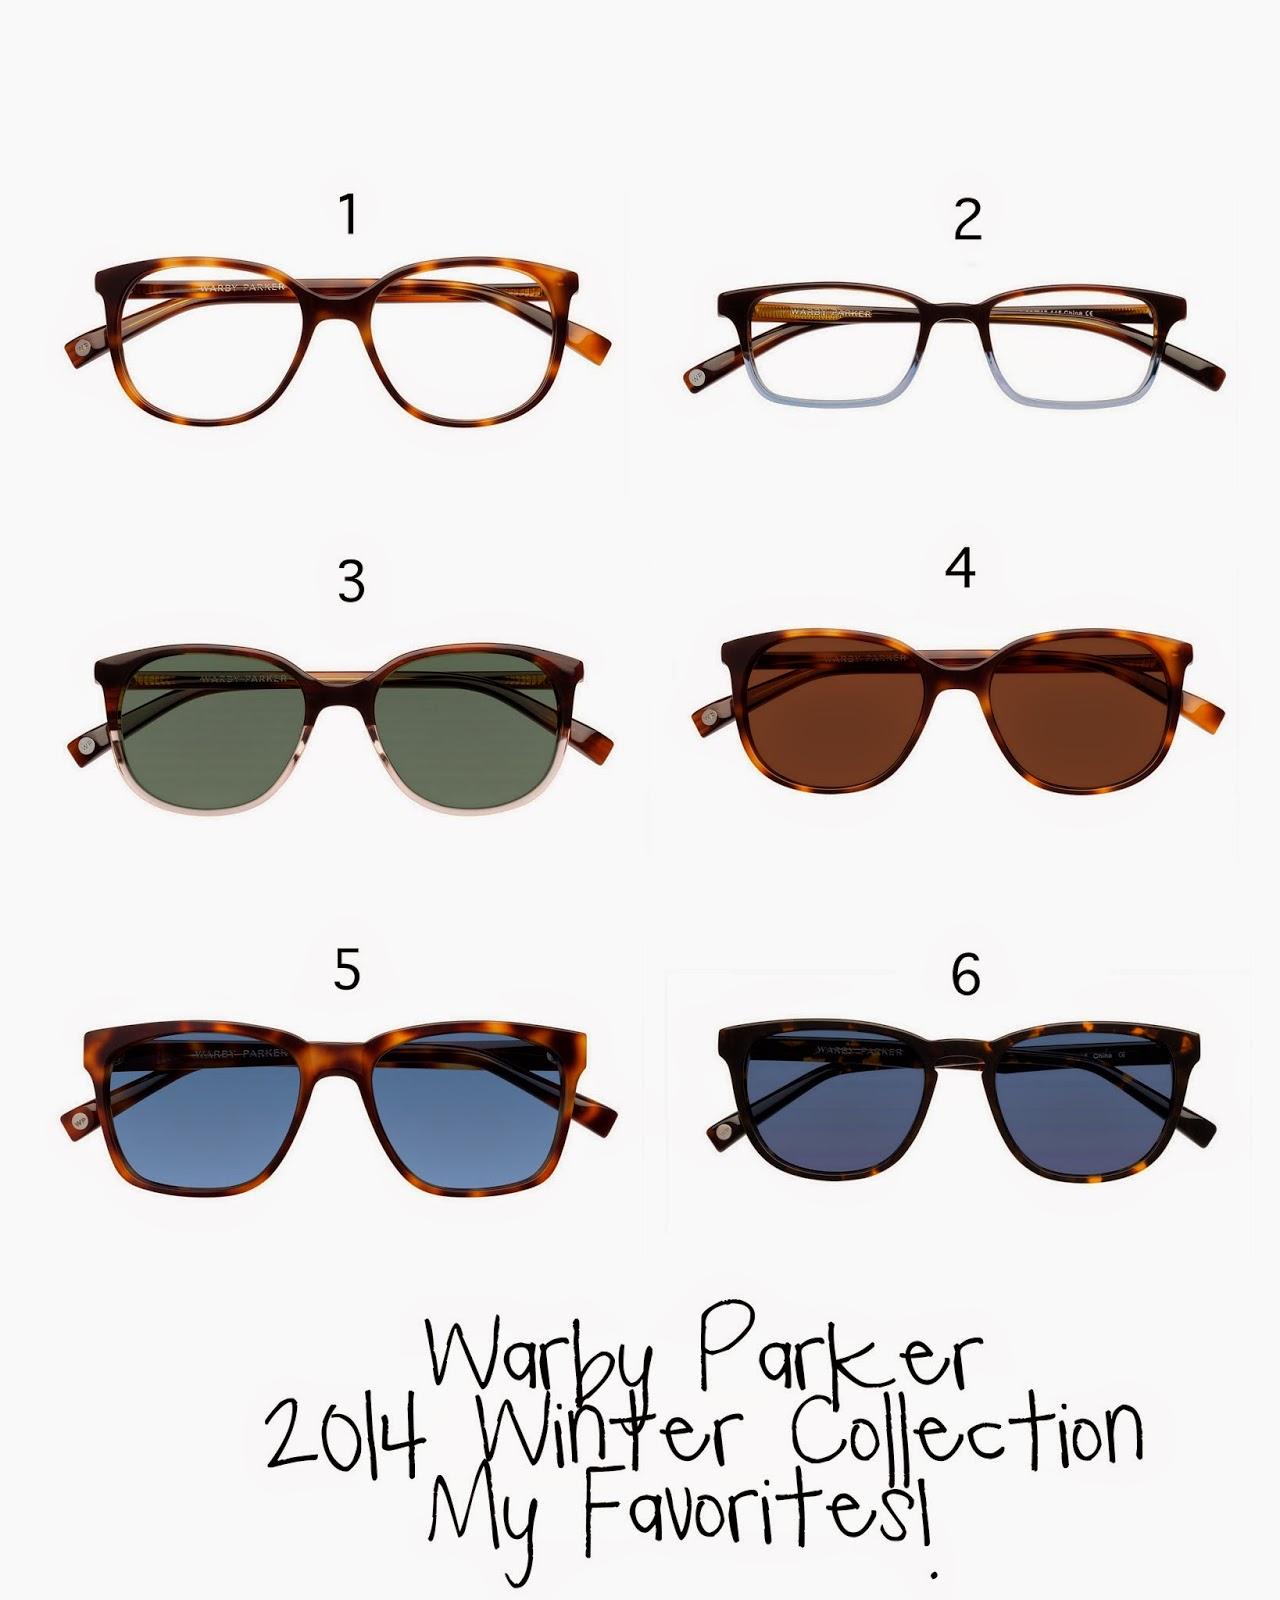 432d560c5e0e Warby Parker s Winter Collection